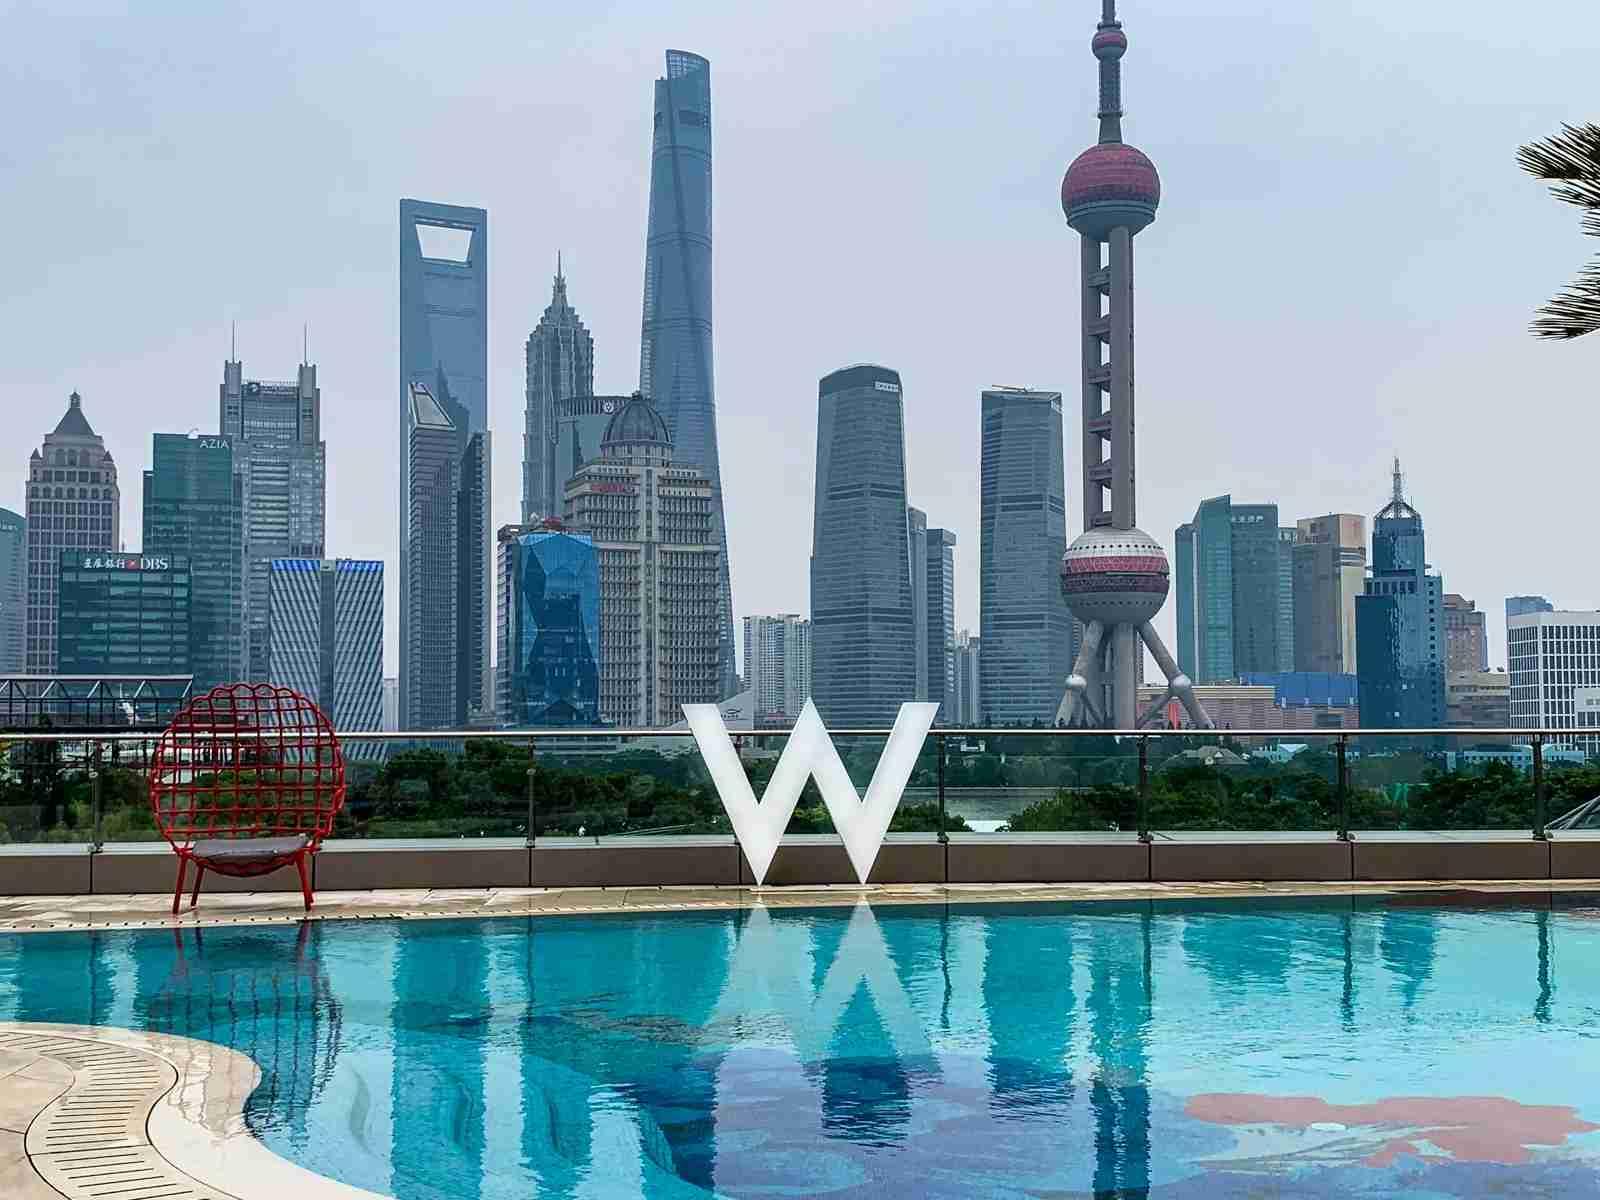 W Shanghai (Photo courtesy of Ethan Steinberg)